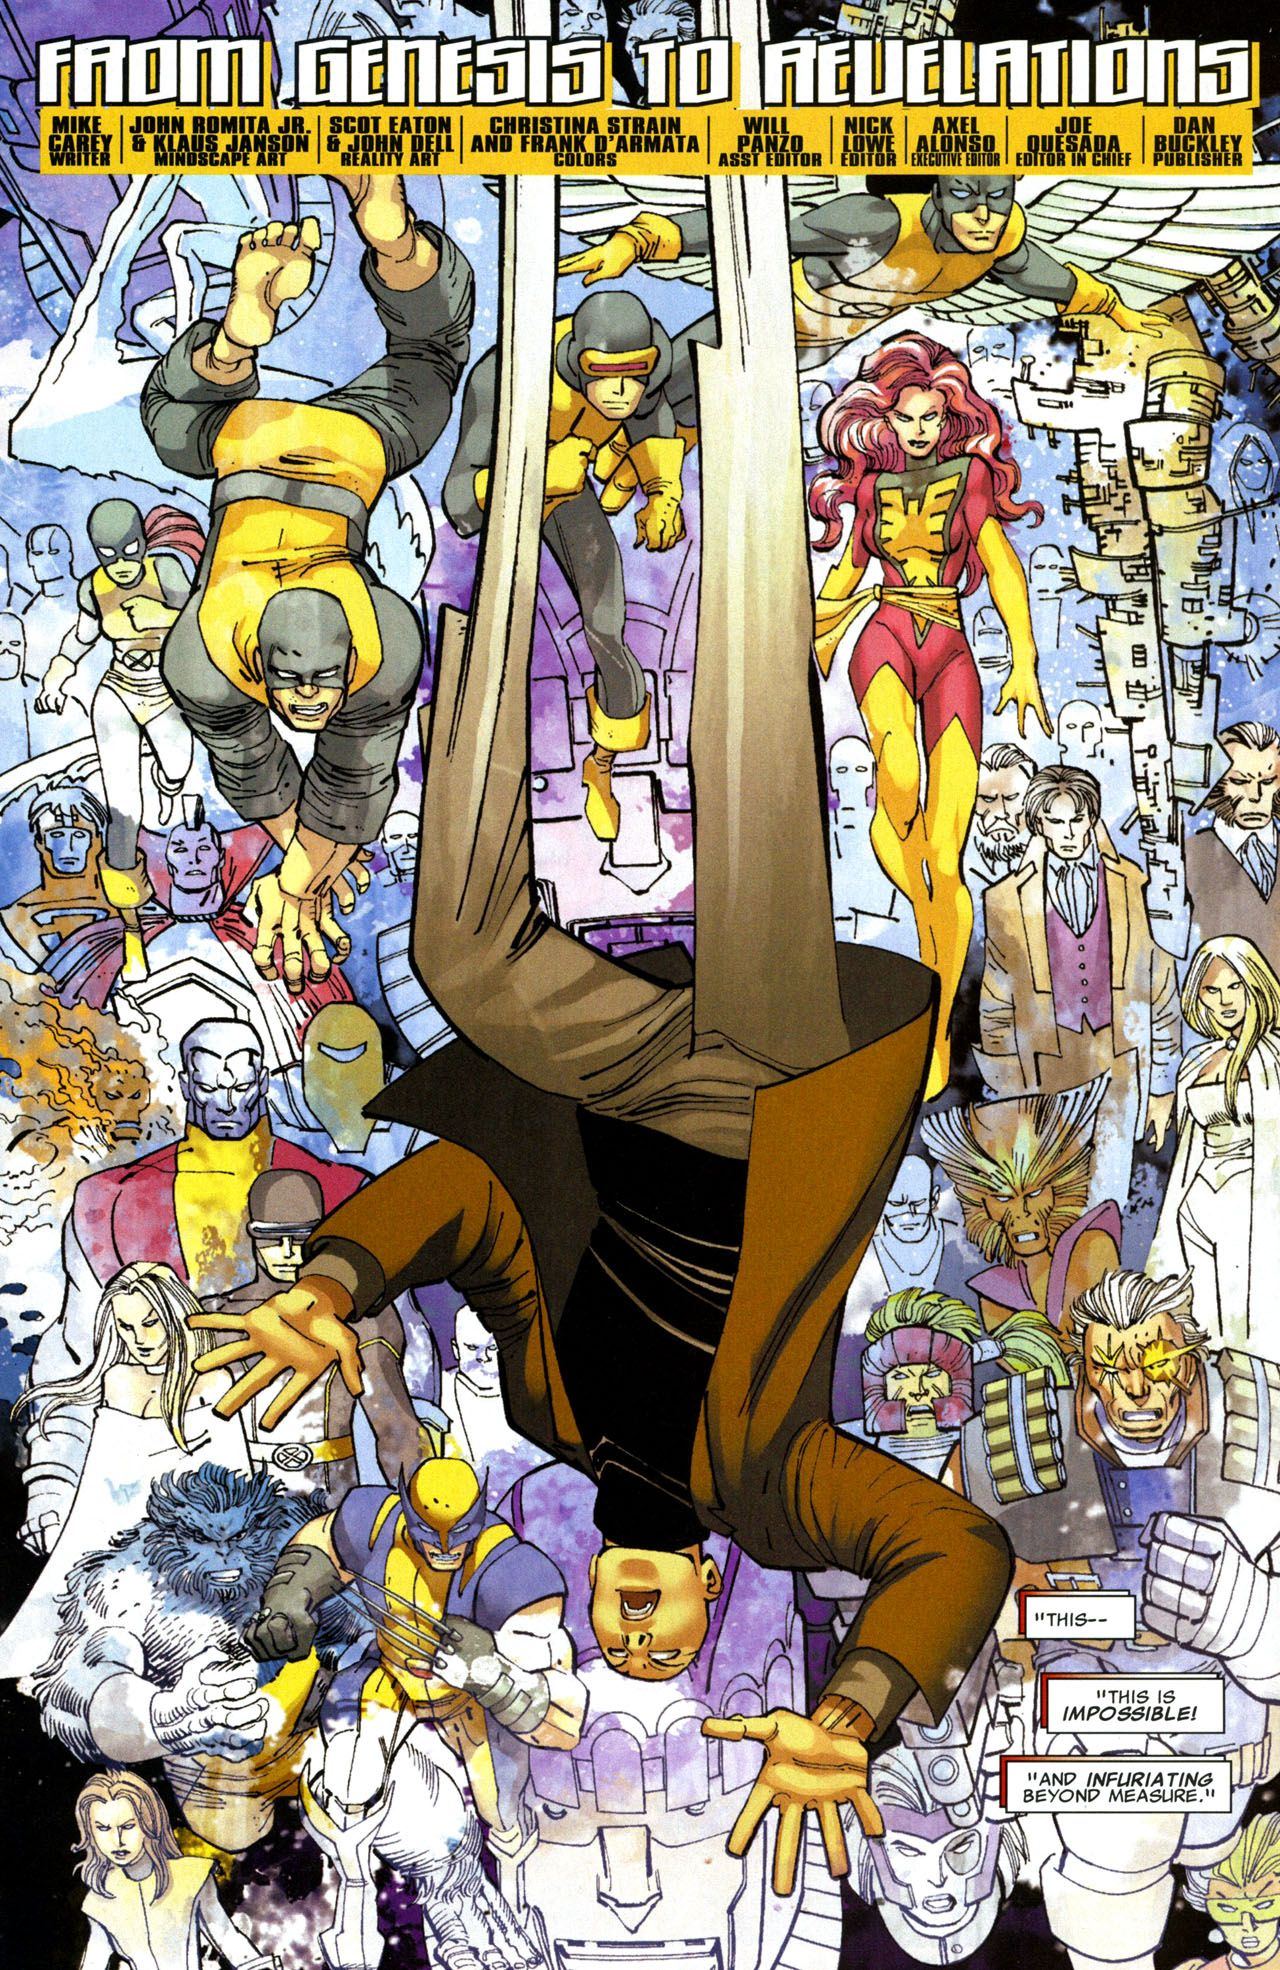 X Men Legacy Vol 1 208 Art By John Romita Jr Klaus Janson Comic Book Heroes John Romita Jr Comic Book Cover